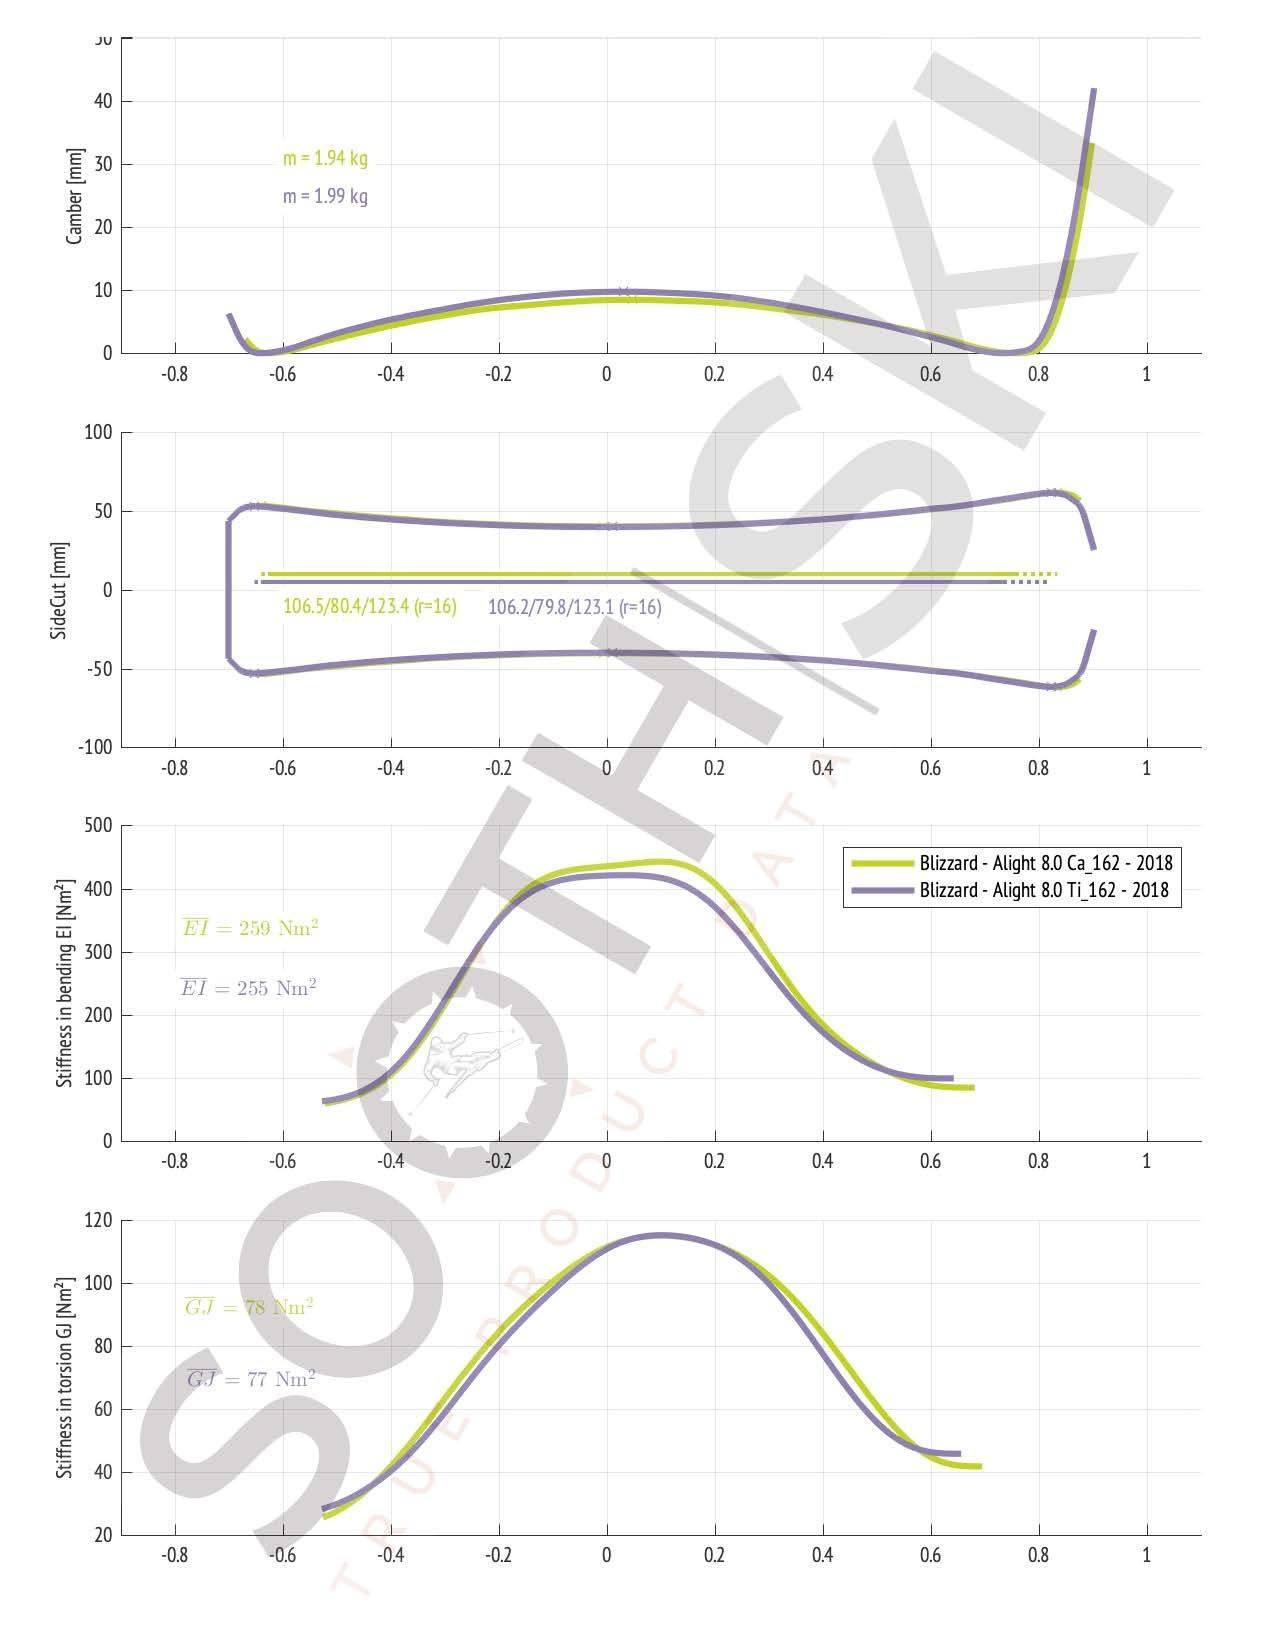 Compare Blizzard Alight 8.0 C 162cm versus Alight 8.0 Ti 162cm (geometry, bending and torsional stiffness)